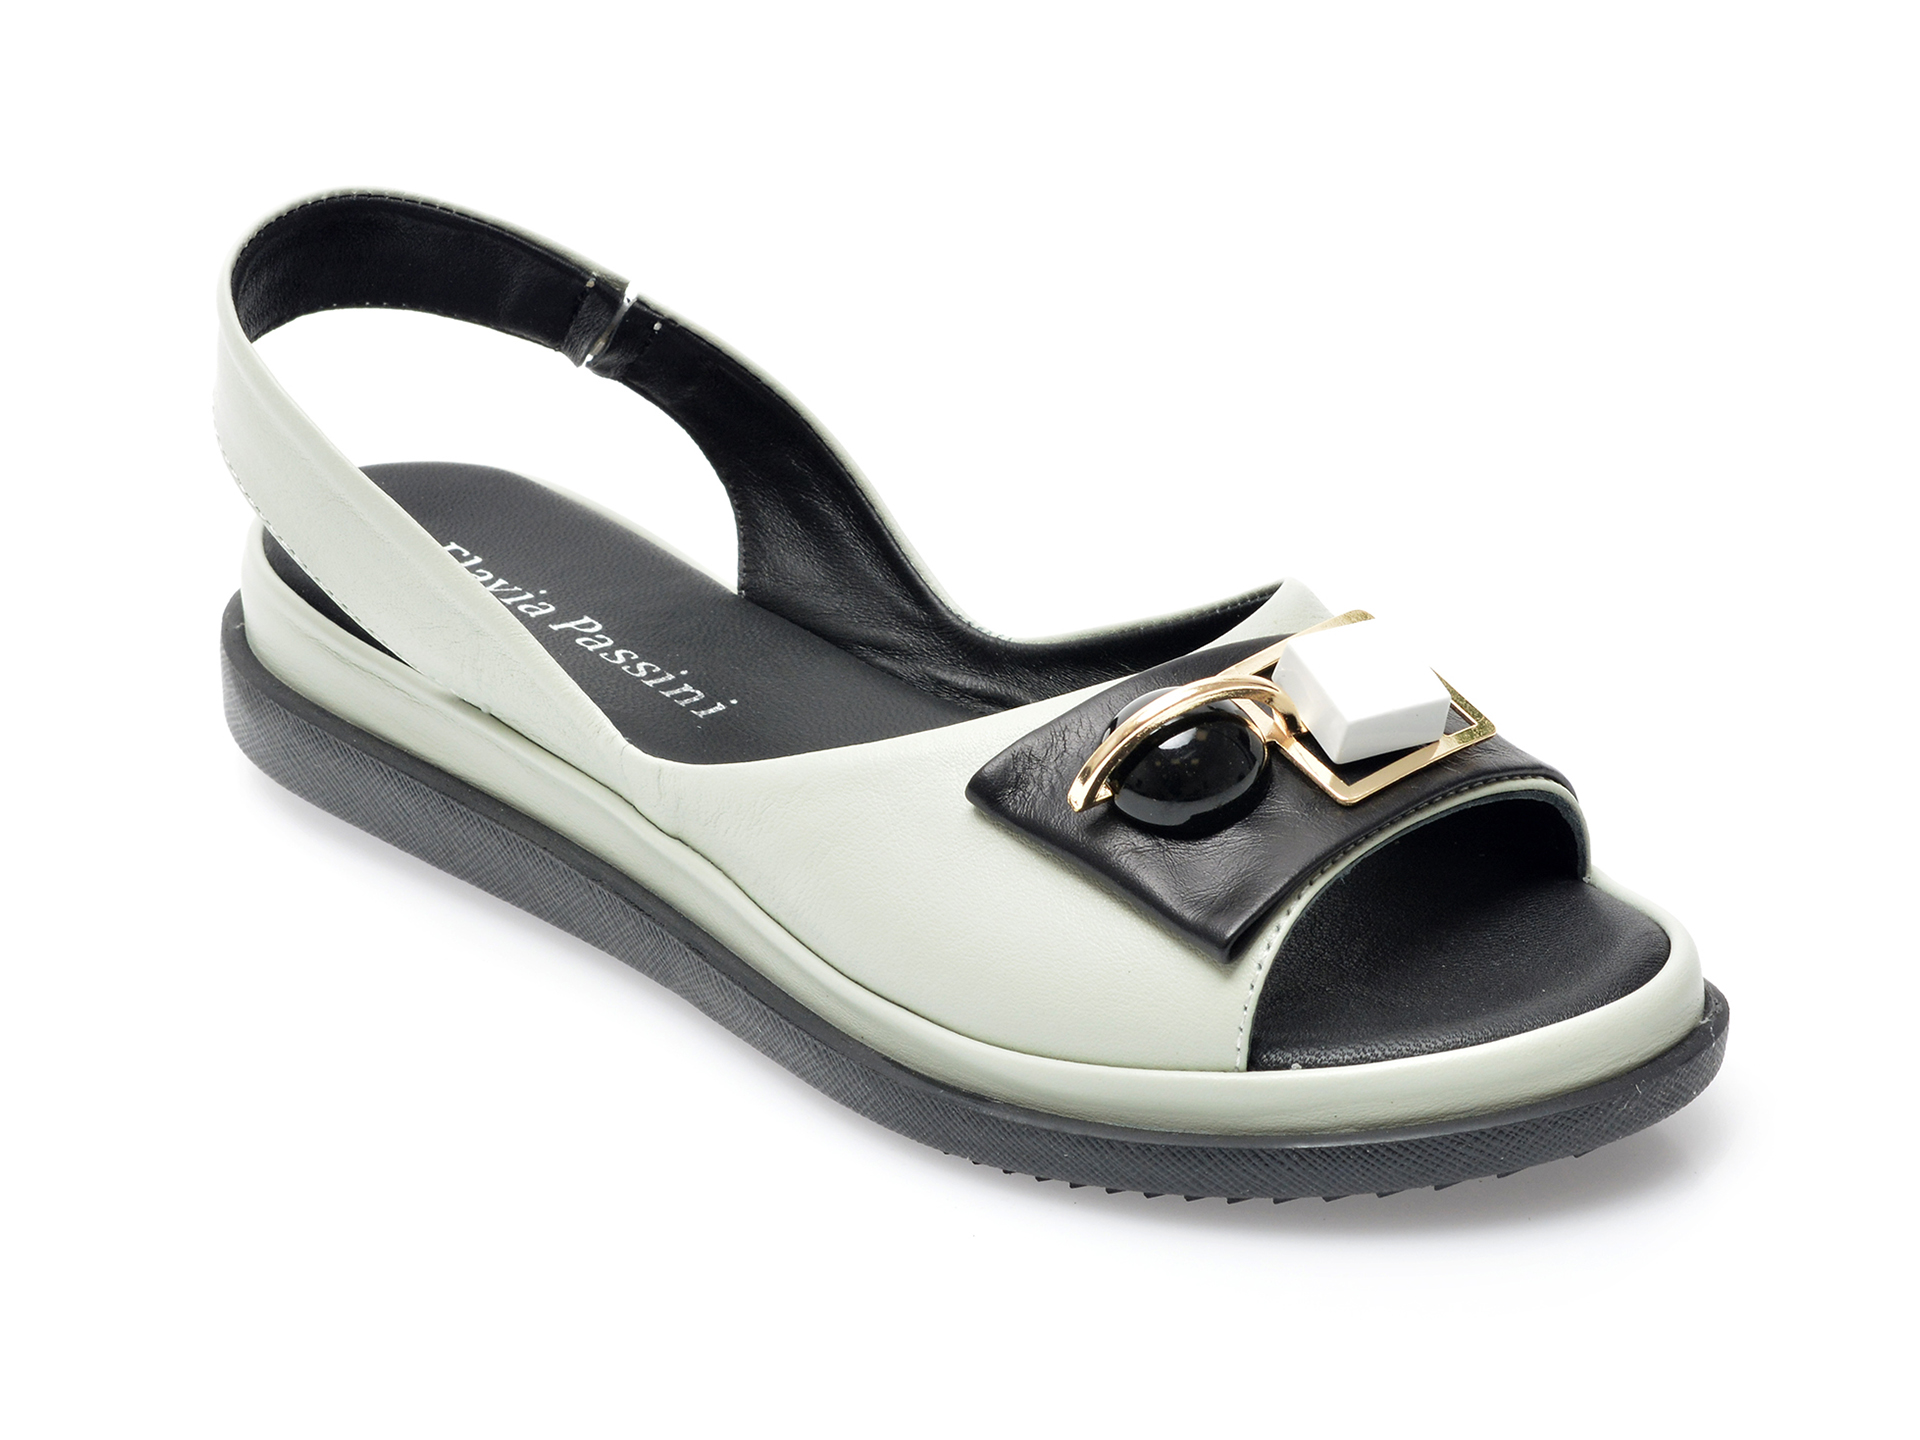 Sandale FLAVIA PASSINI verzi, 207217, din piele naturala imagine otter.ro 2021